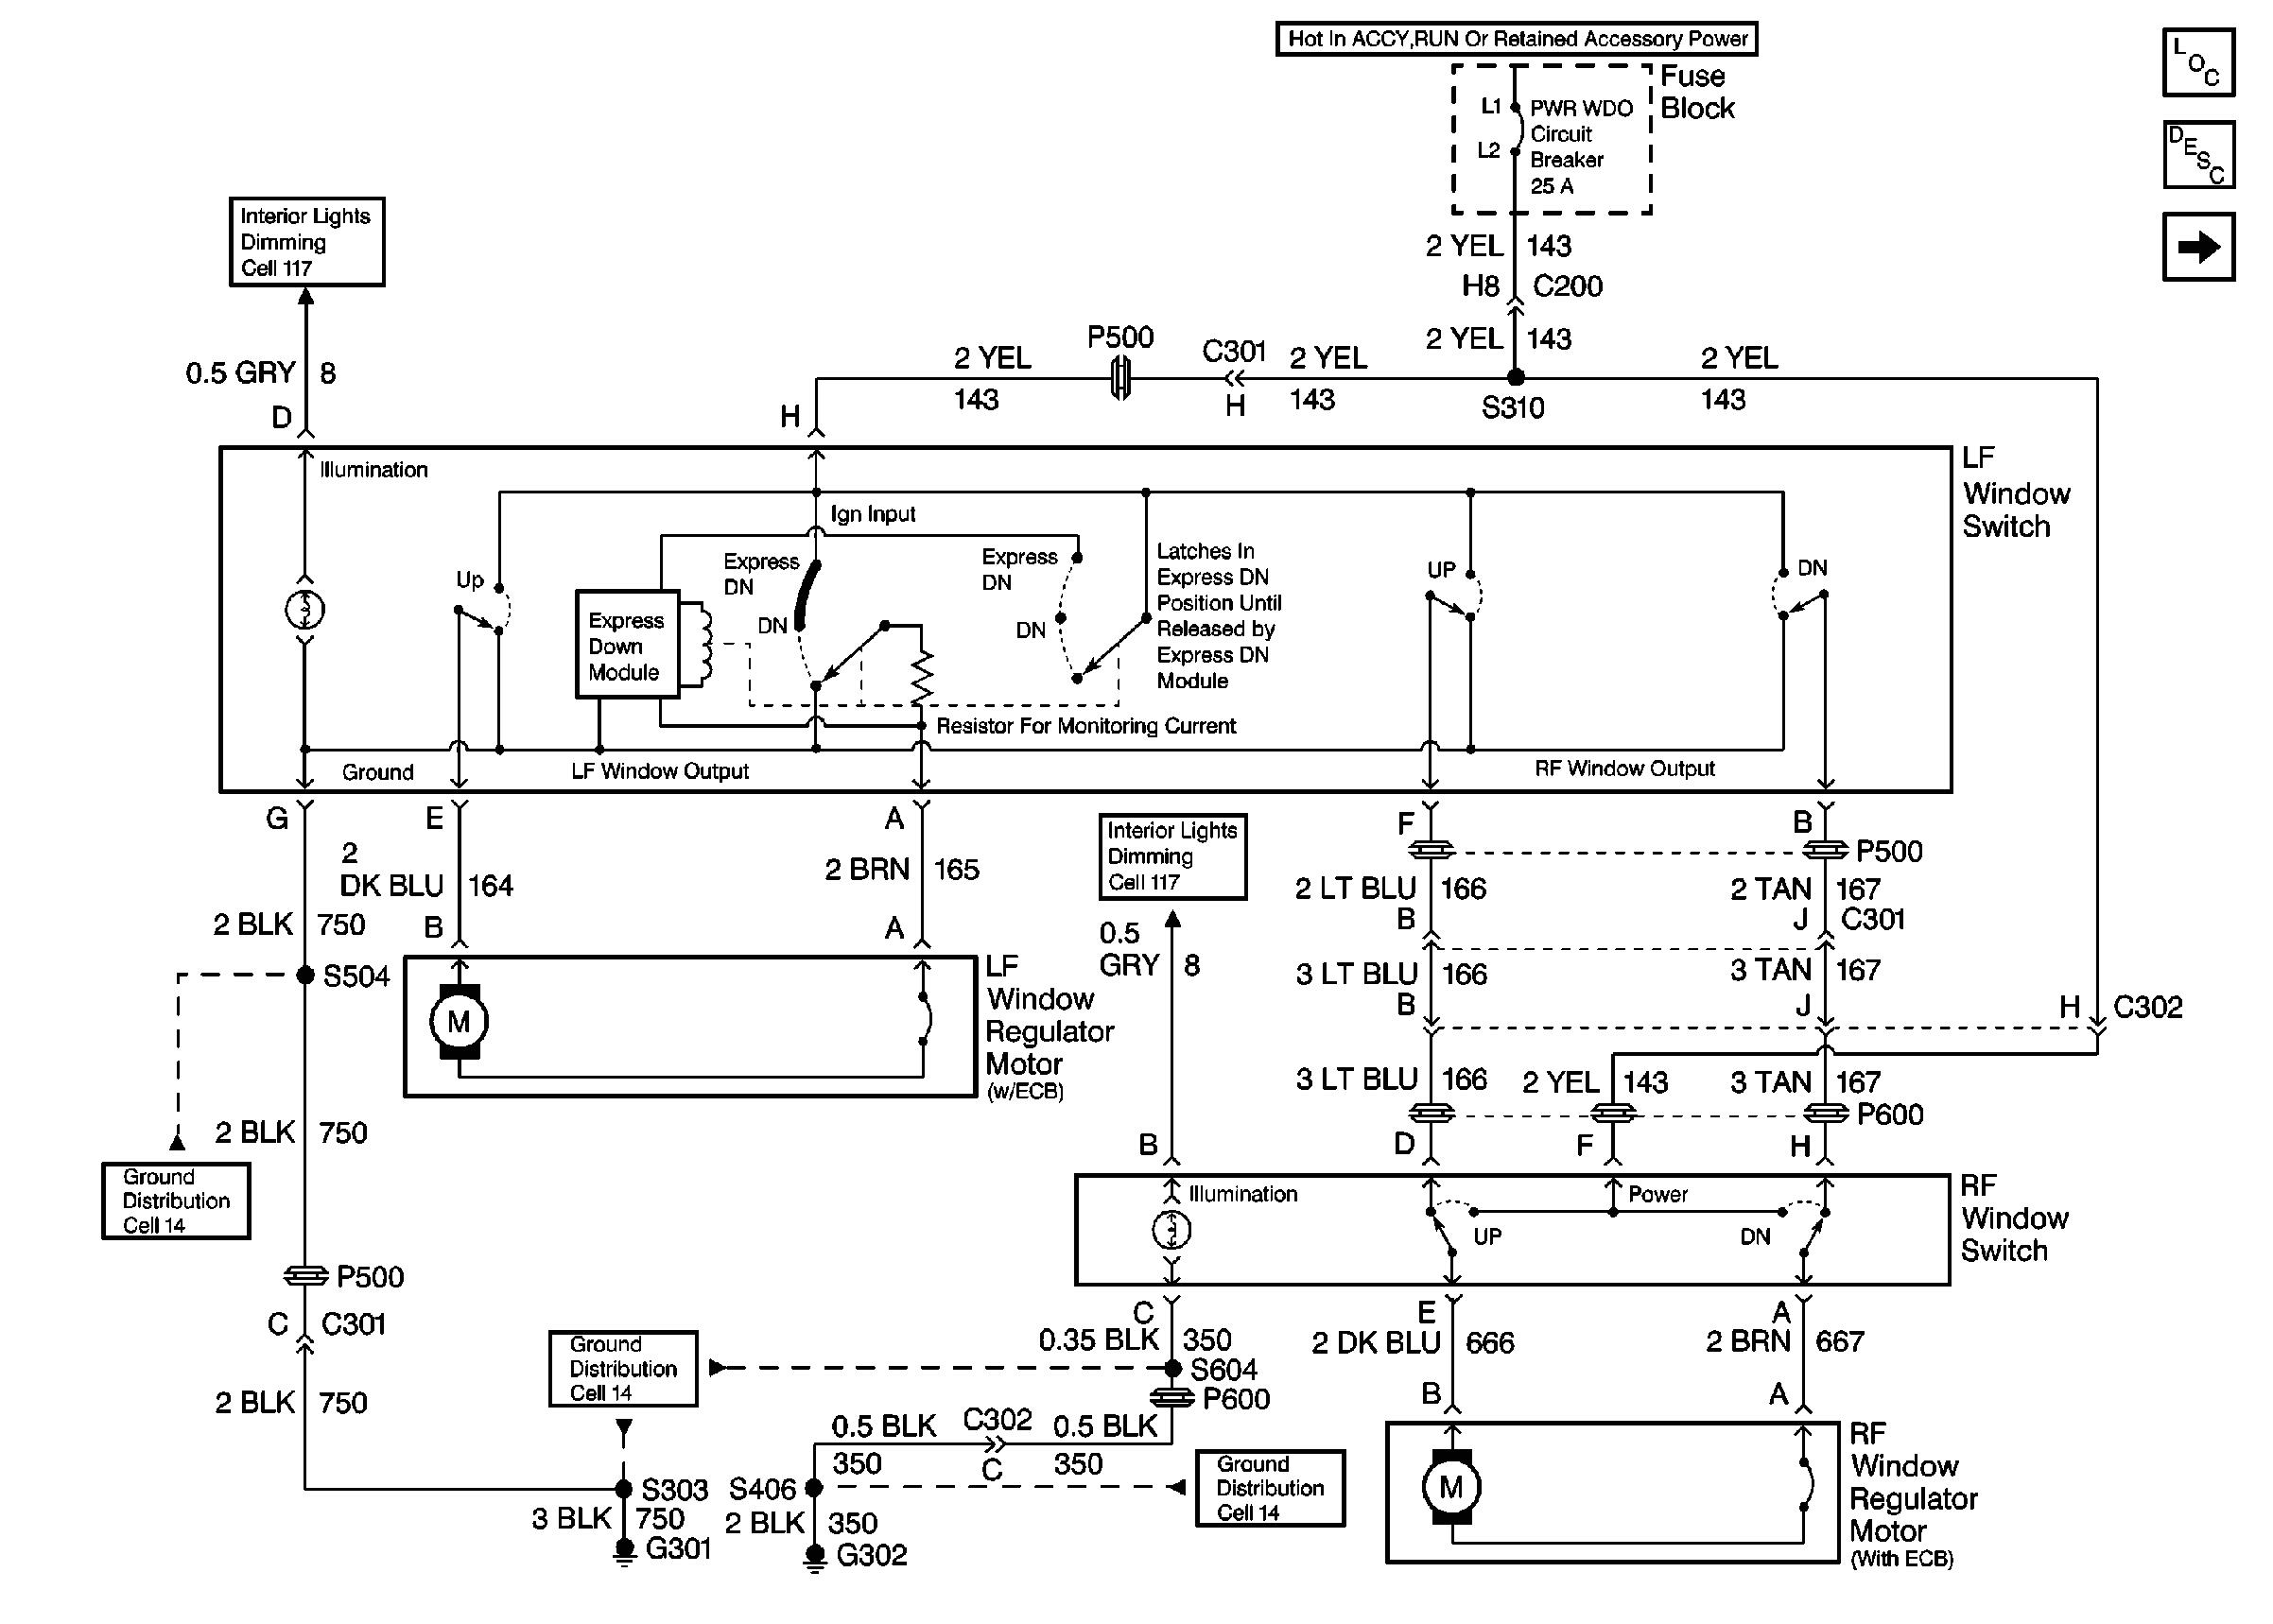 2002 Pontiac Grand Prix Wiring Diagram Rear Window Wiring Diagram 2003 Grand Prix Wiring Diagram Host